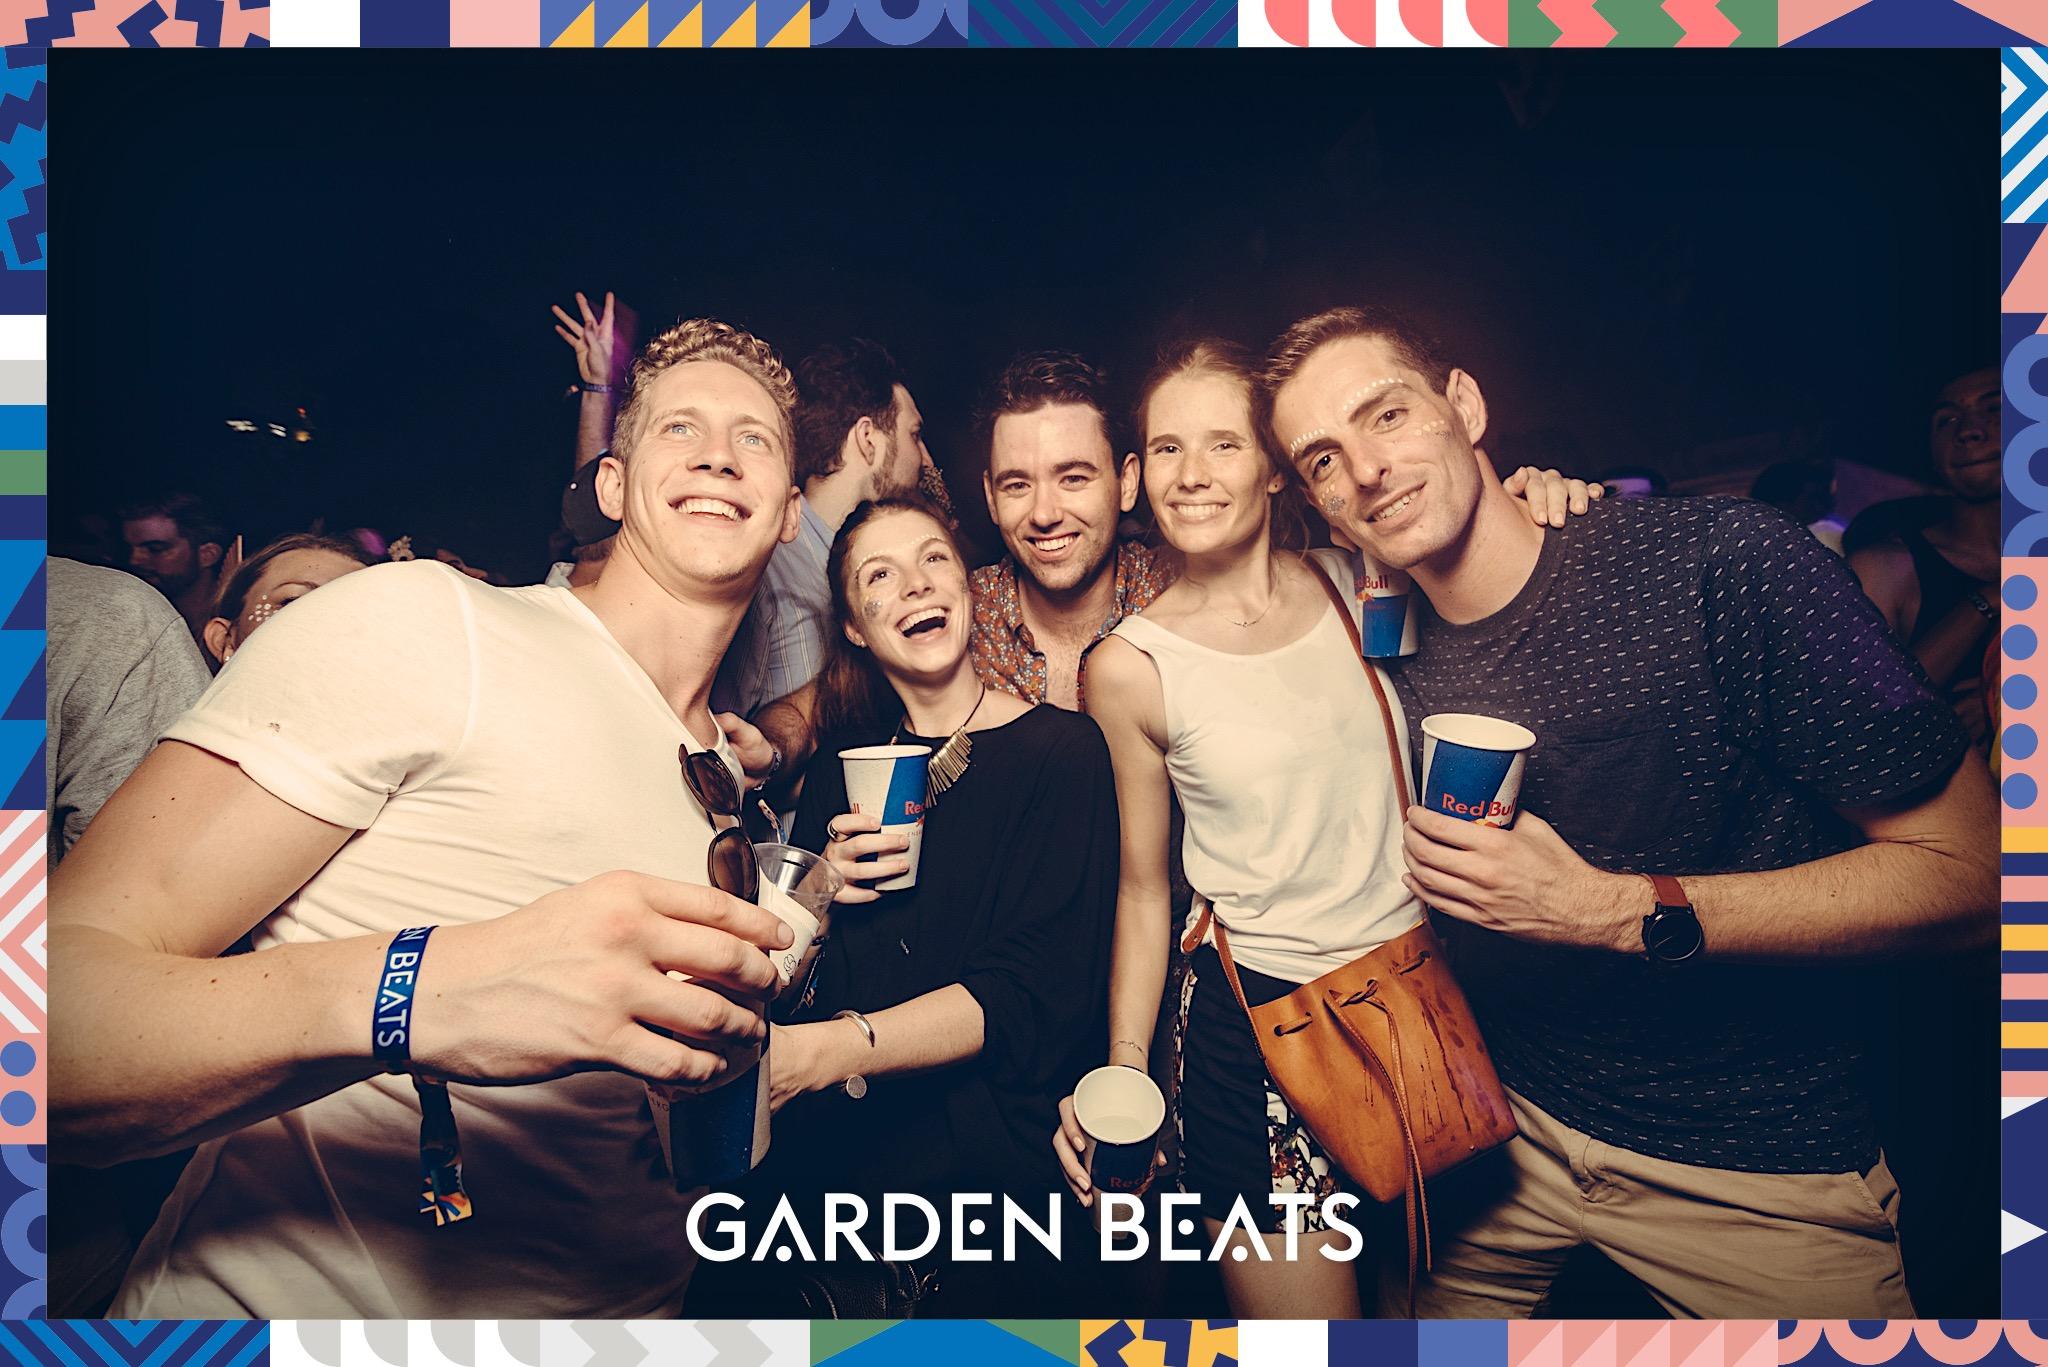 18032017_GardenBeats_Colossal757_WatermarkedGB.jpg